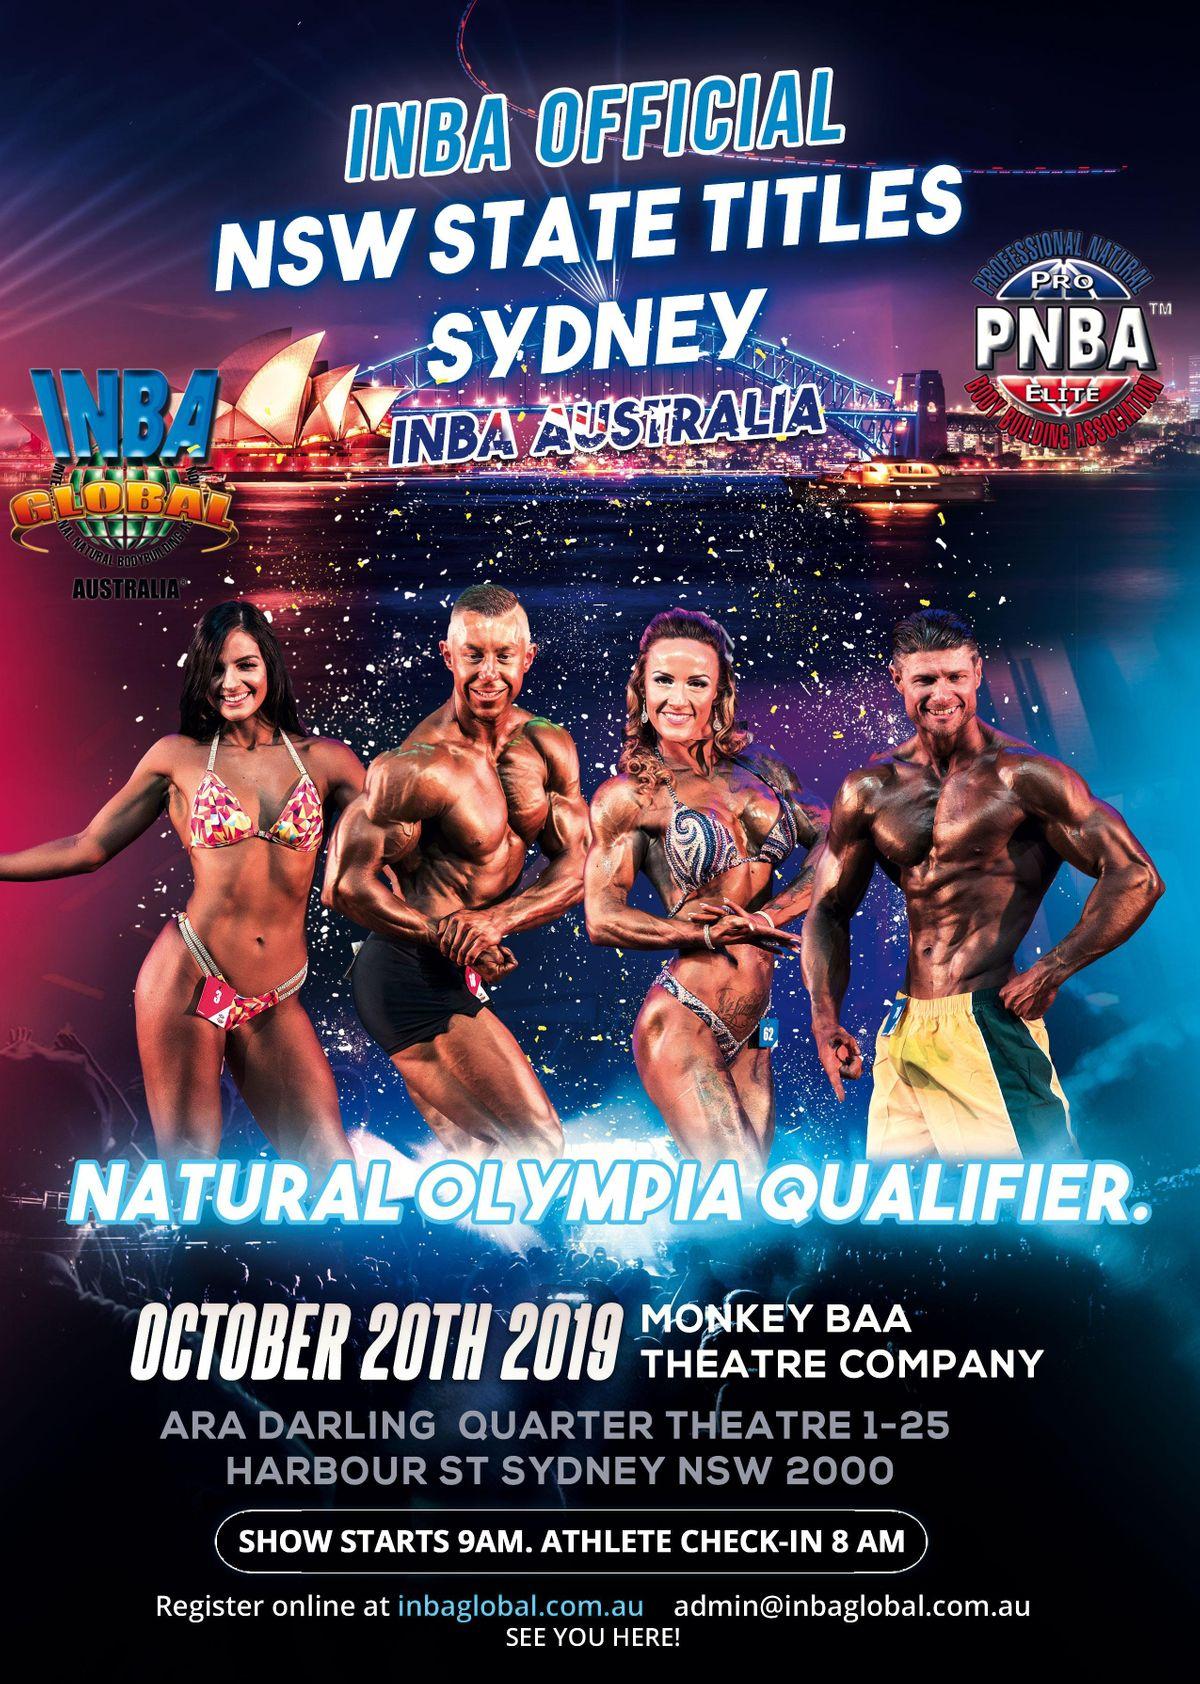 INBA GLOBAL AUSTRALIA NSW STATE TITLES